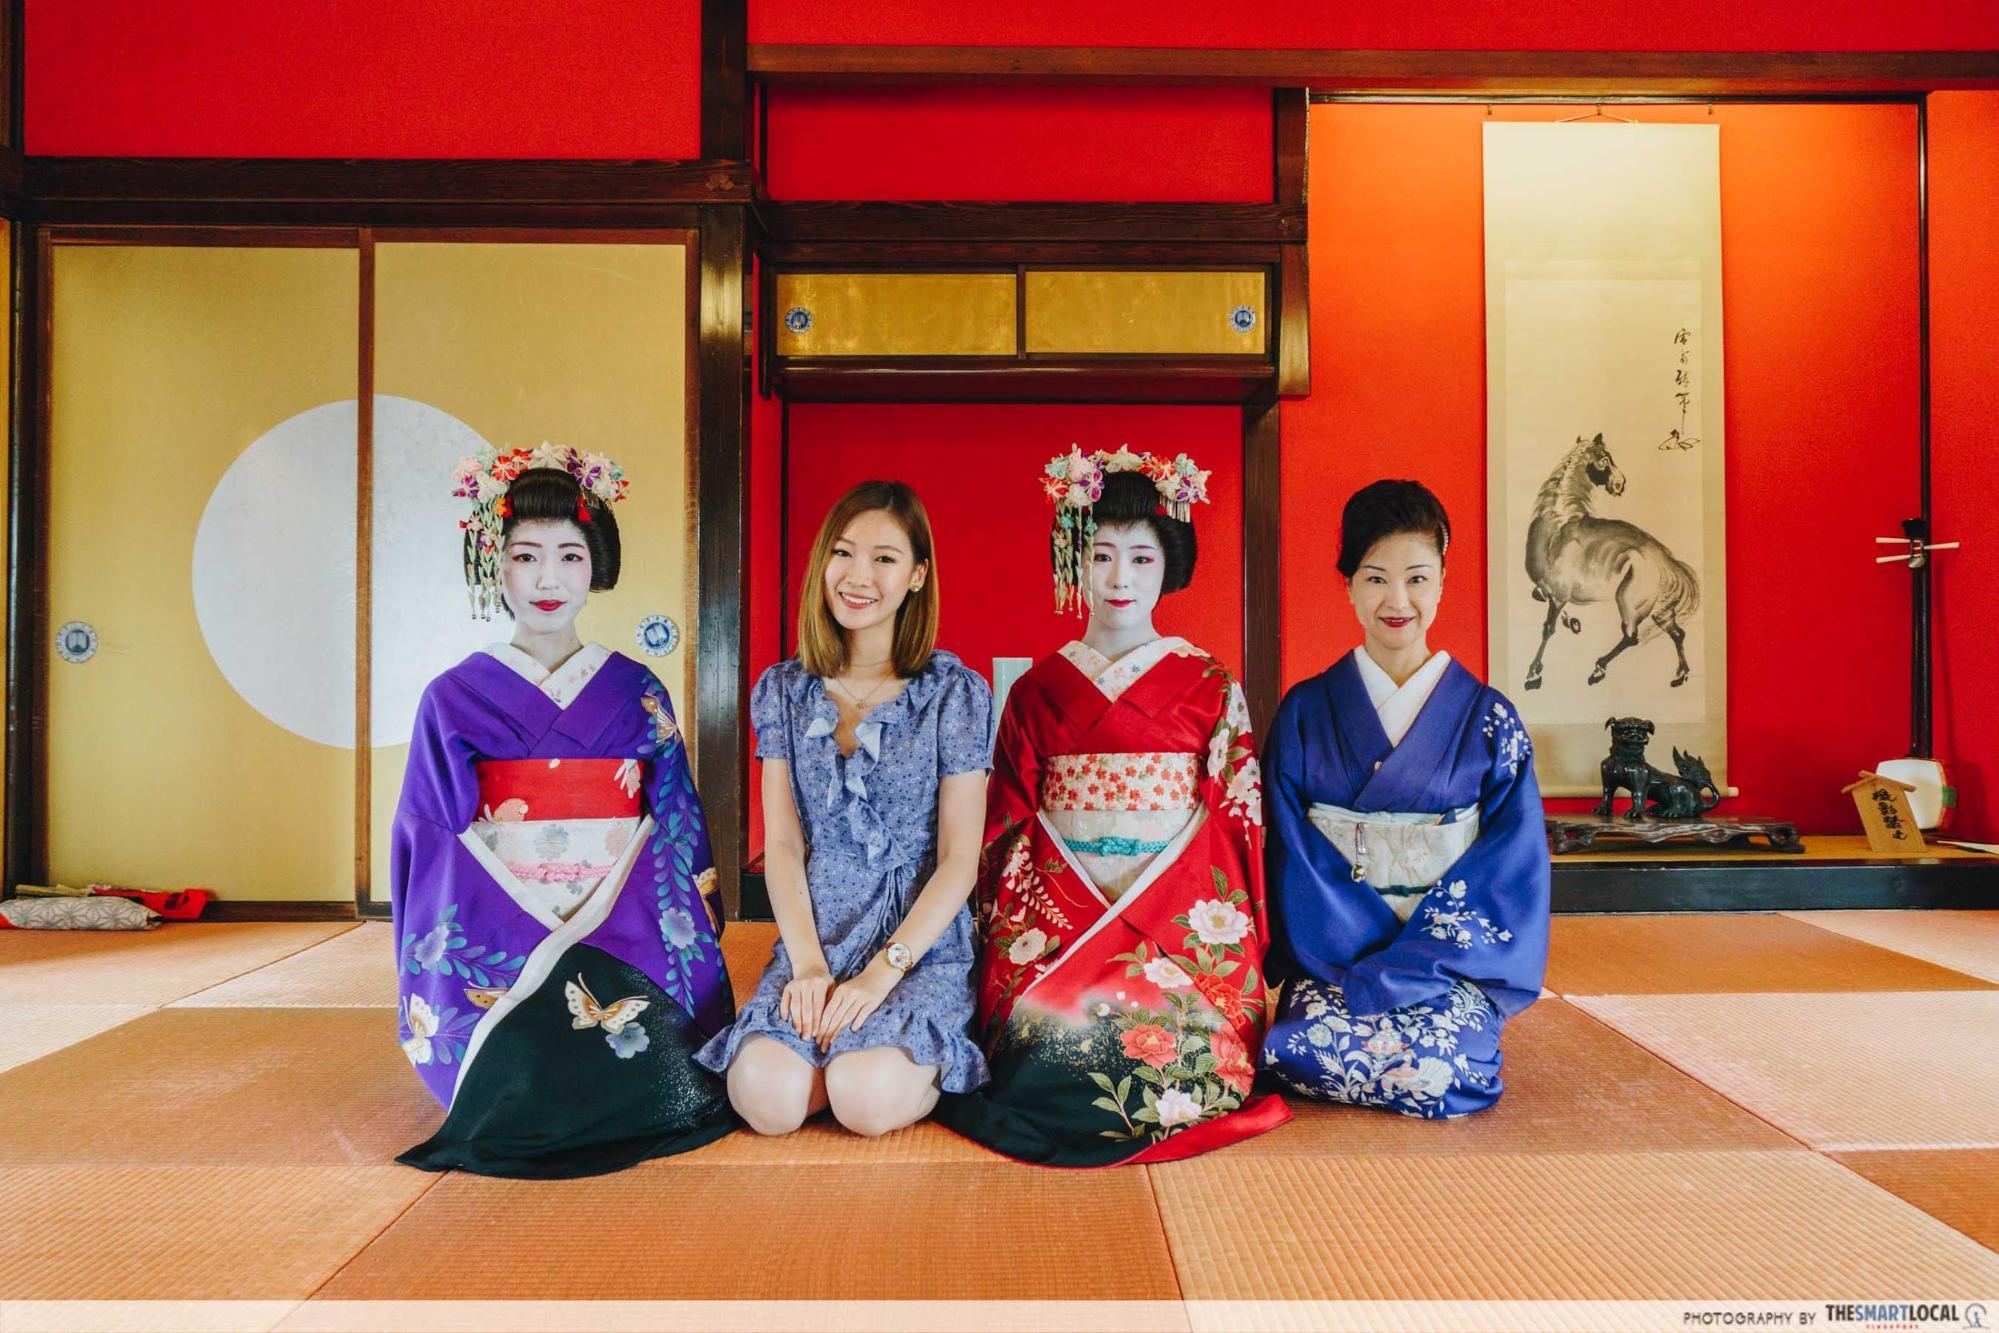 Tohoku Japan -  maiko geisha skata somaro maiko teahouse